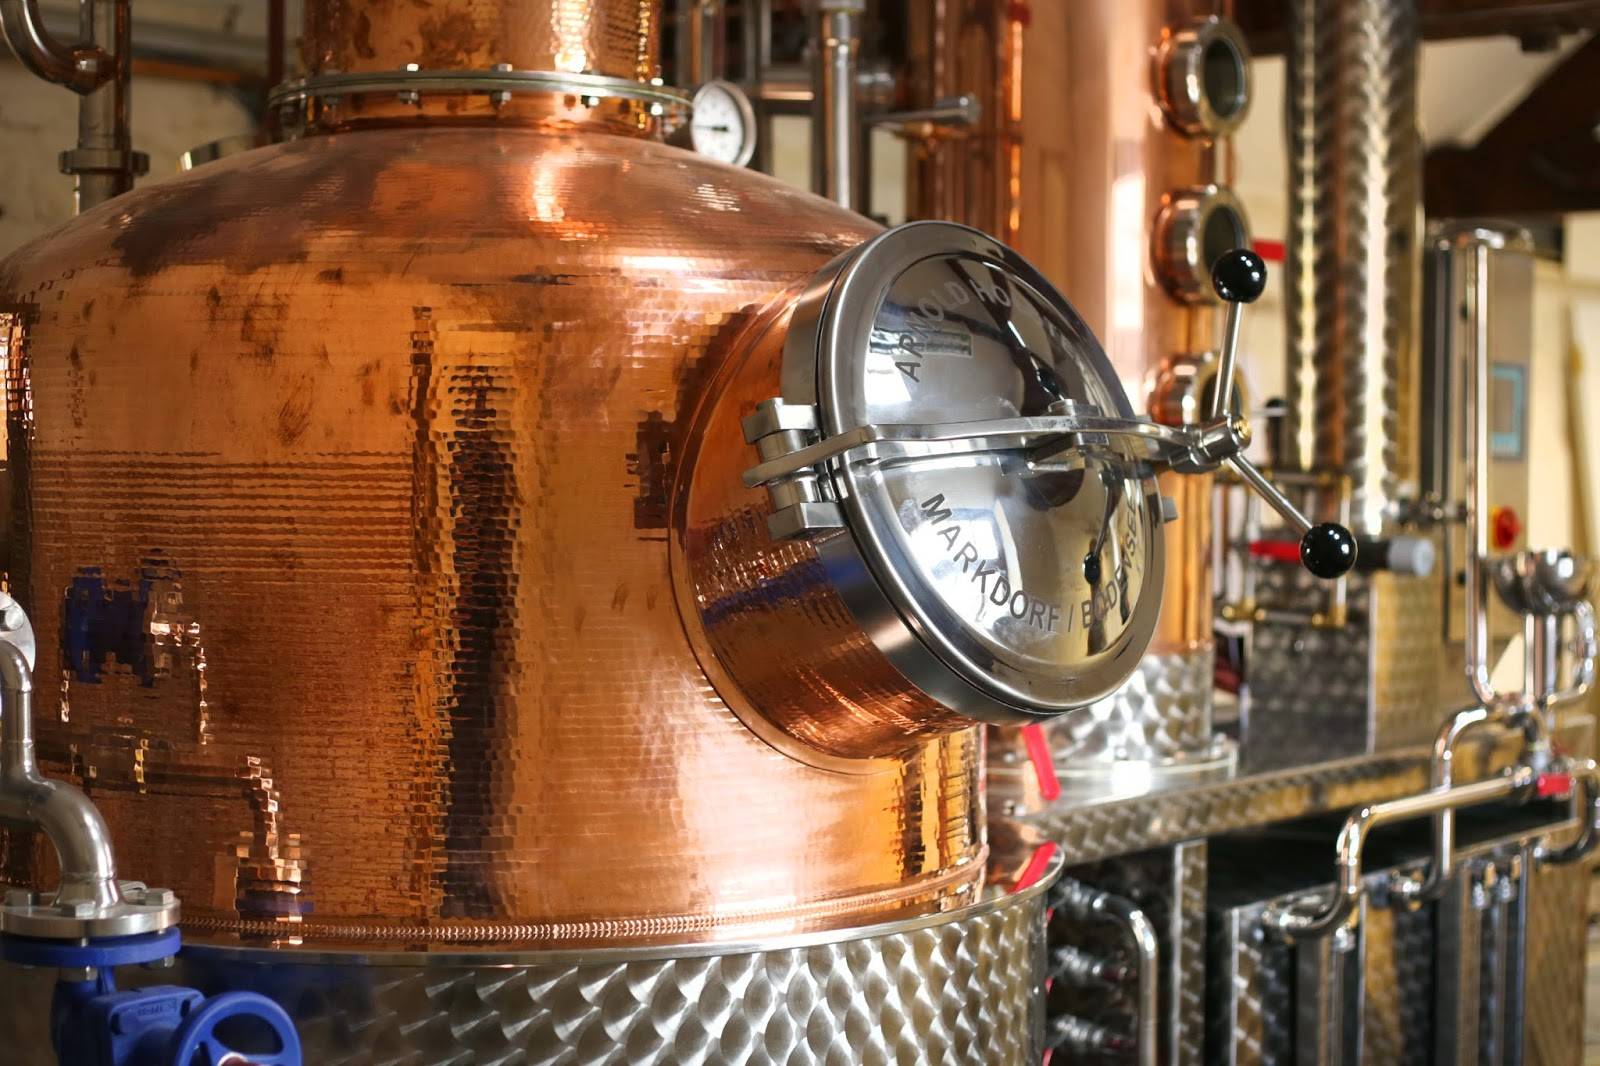 Burleigh's Distillery, Leicestershire, Gingey Bites